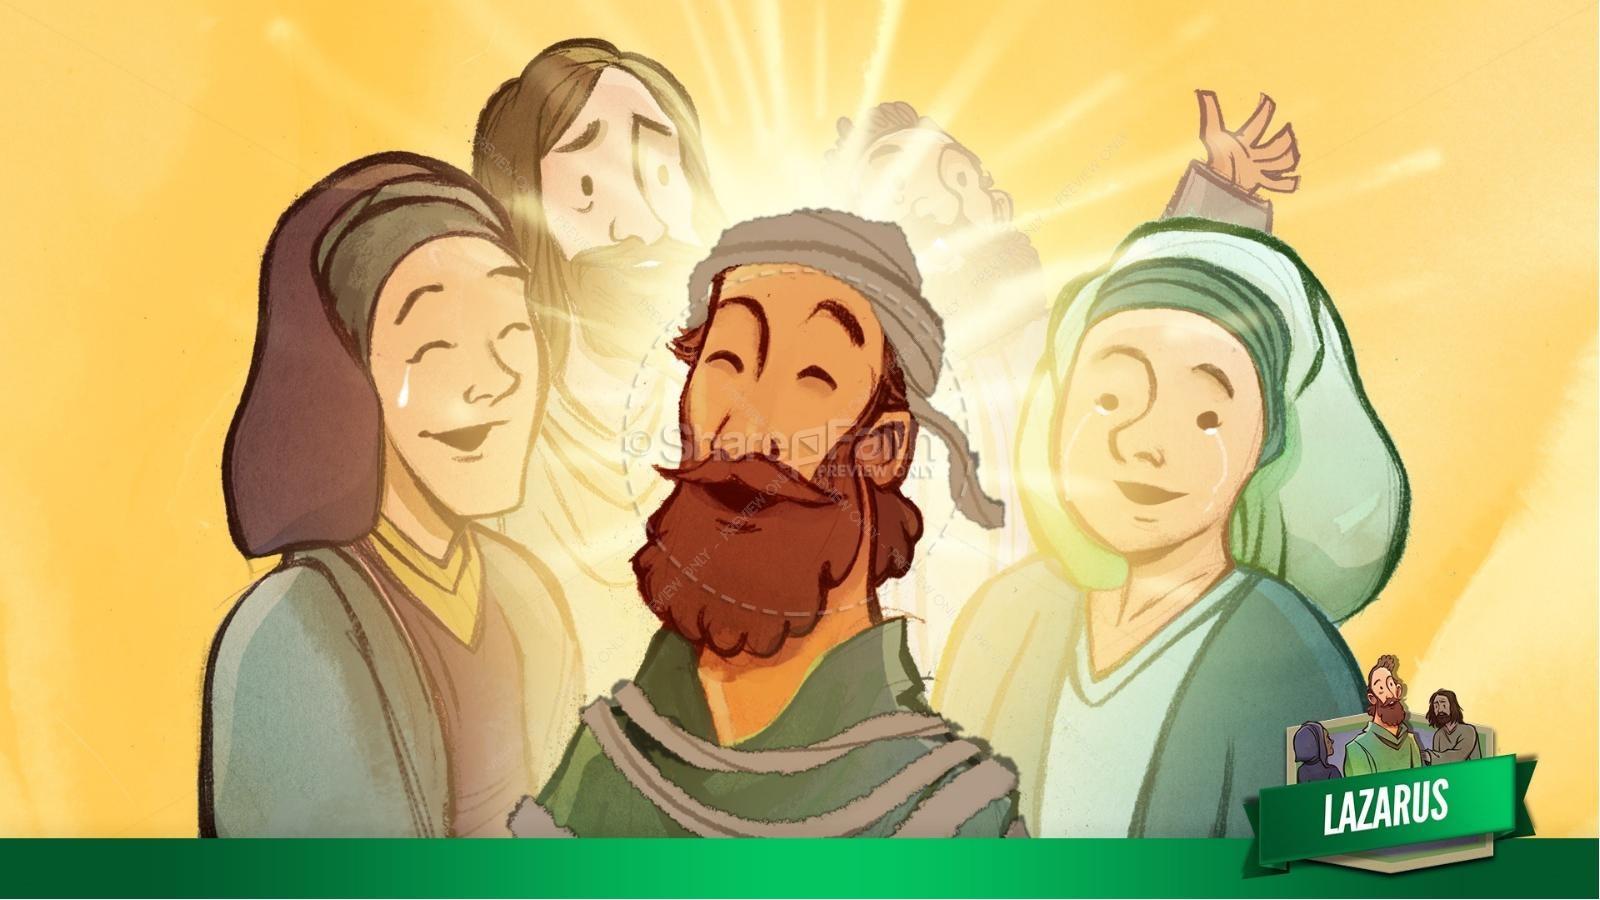 John 11 Lazarus Kids Bible Stories